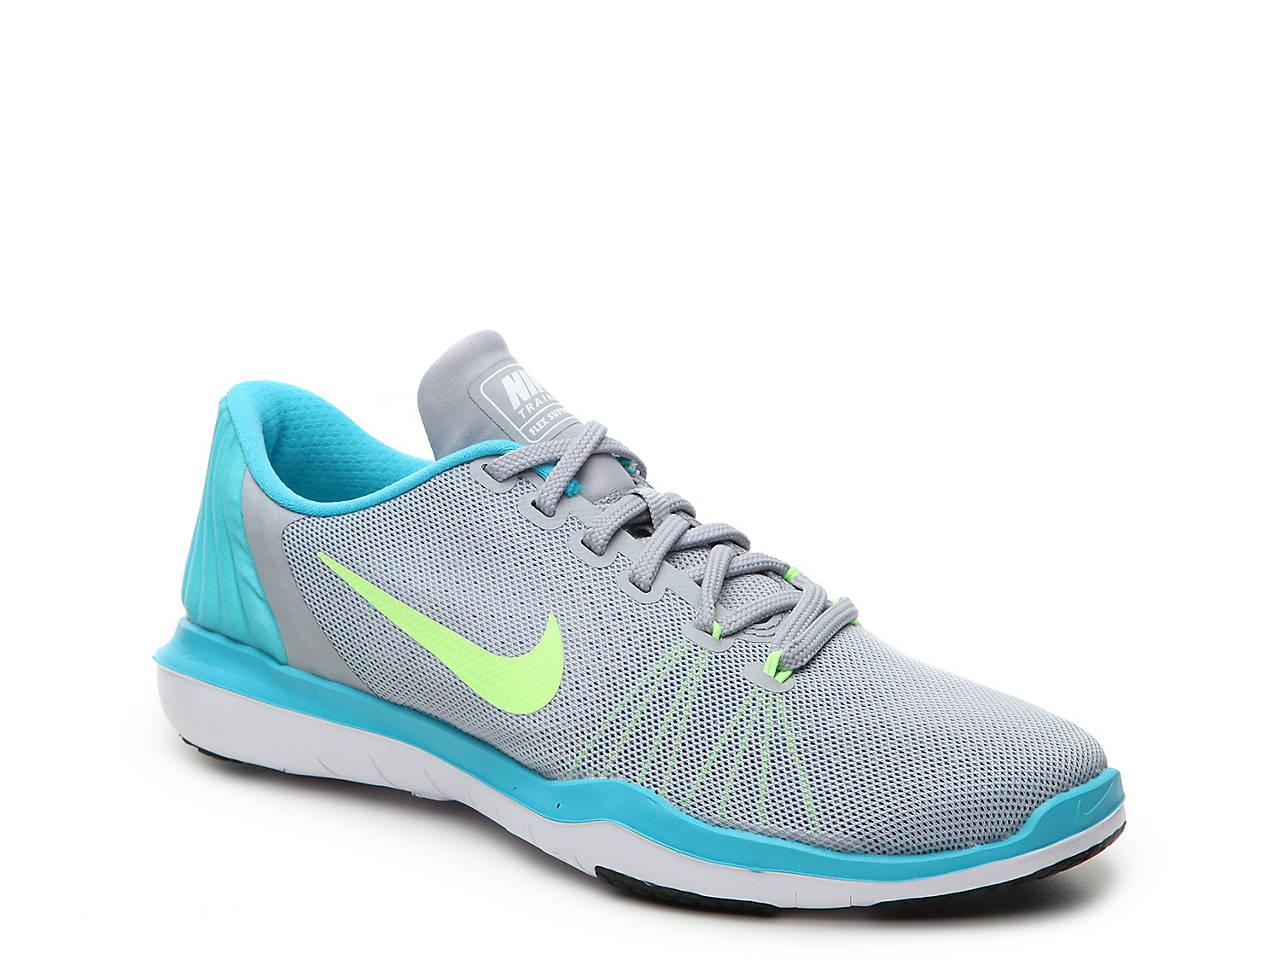 quality design 05f1a 65f6b Flex Supreme TR 5 Training Shoe - Women's